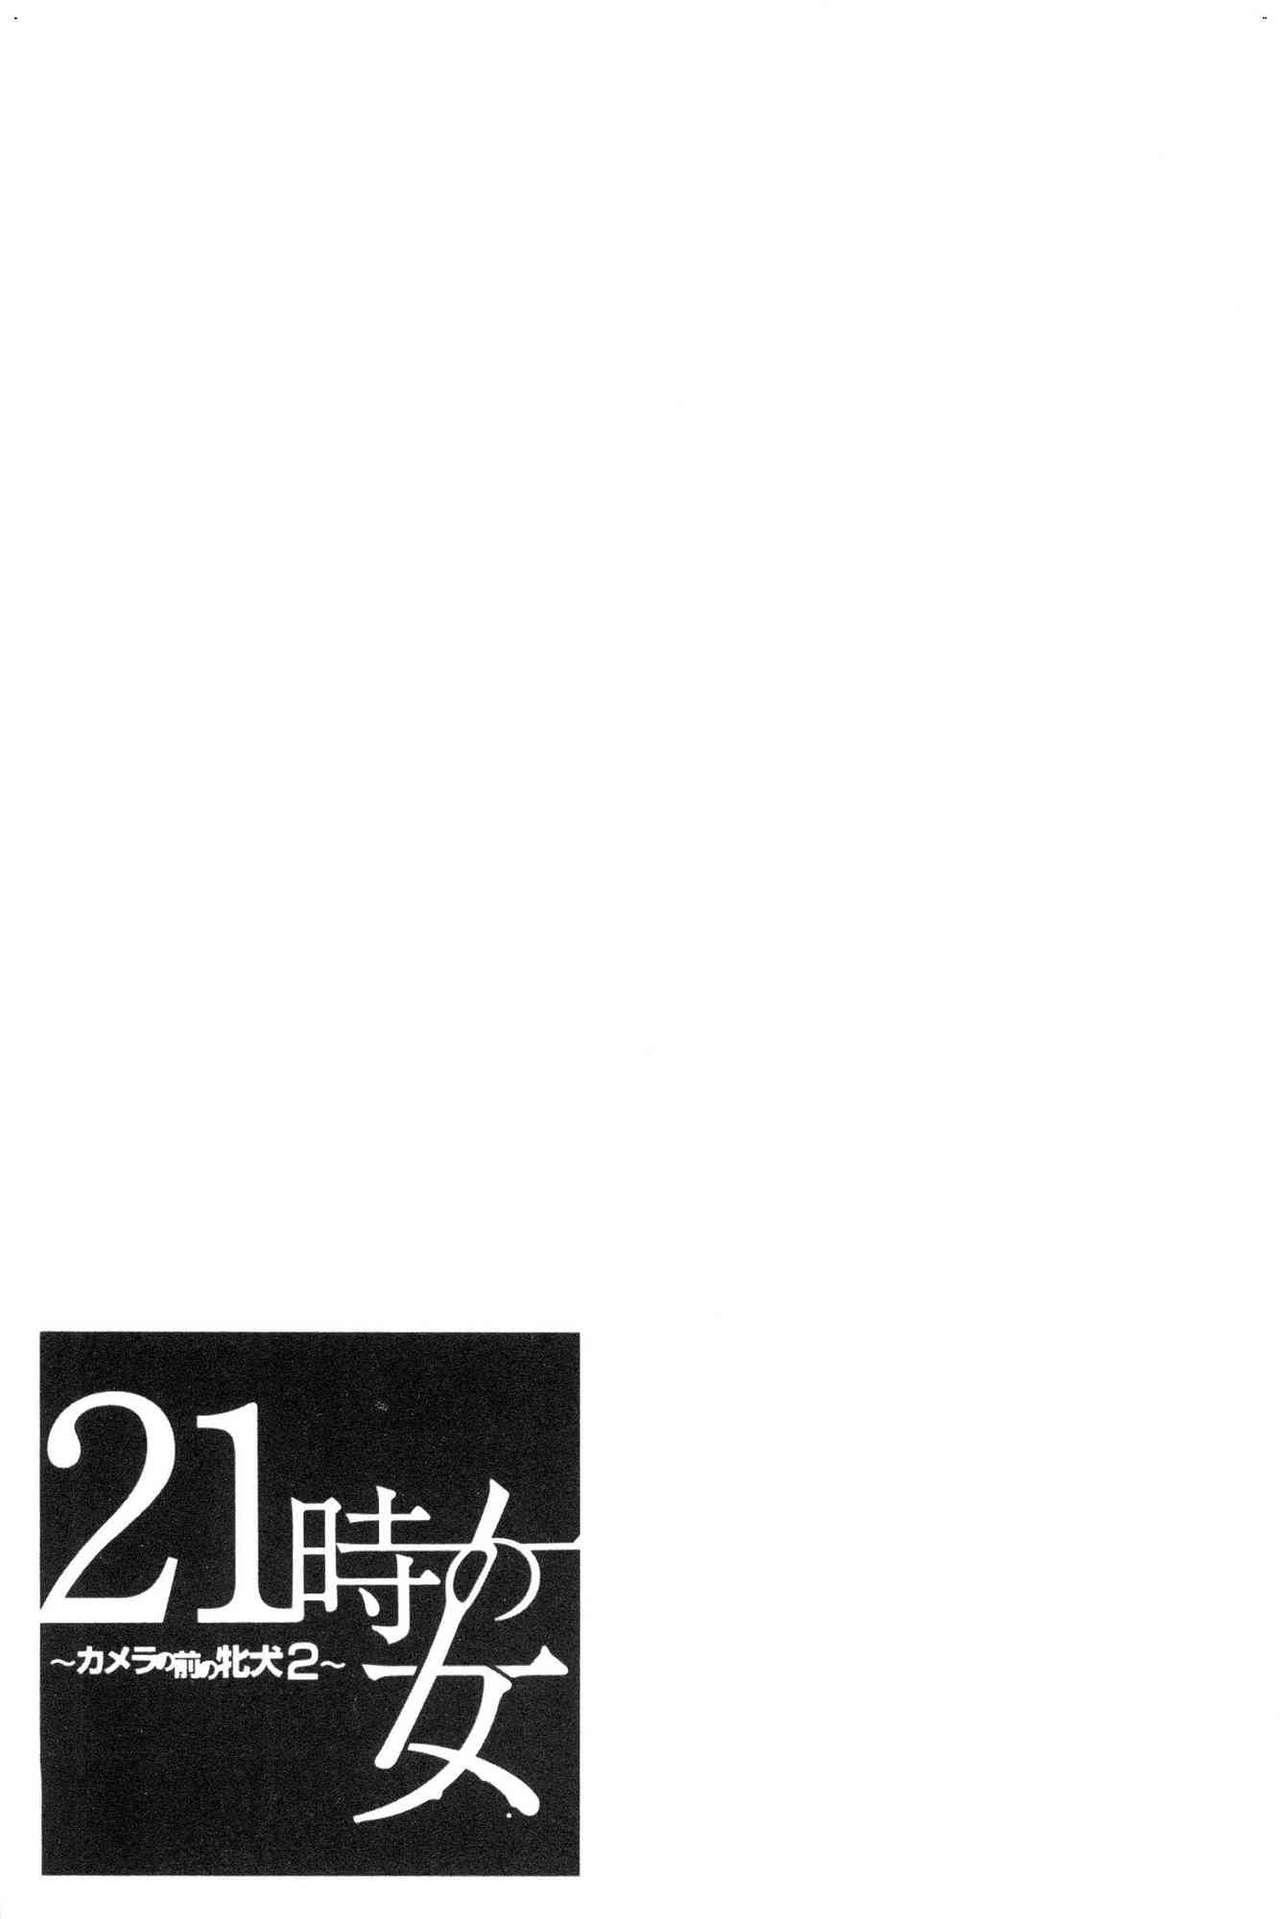 [Gotoh Akira]  21-ji no Onna ~Camera no Mae no Mesuinu~ 2 | 21時之女 ~鏡頭前的牝犬~ 2 [Chinese] 96